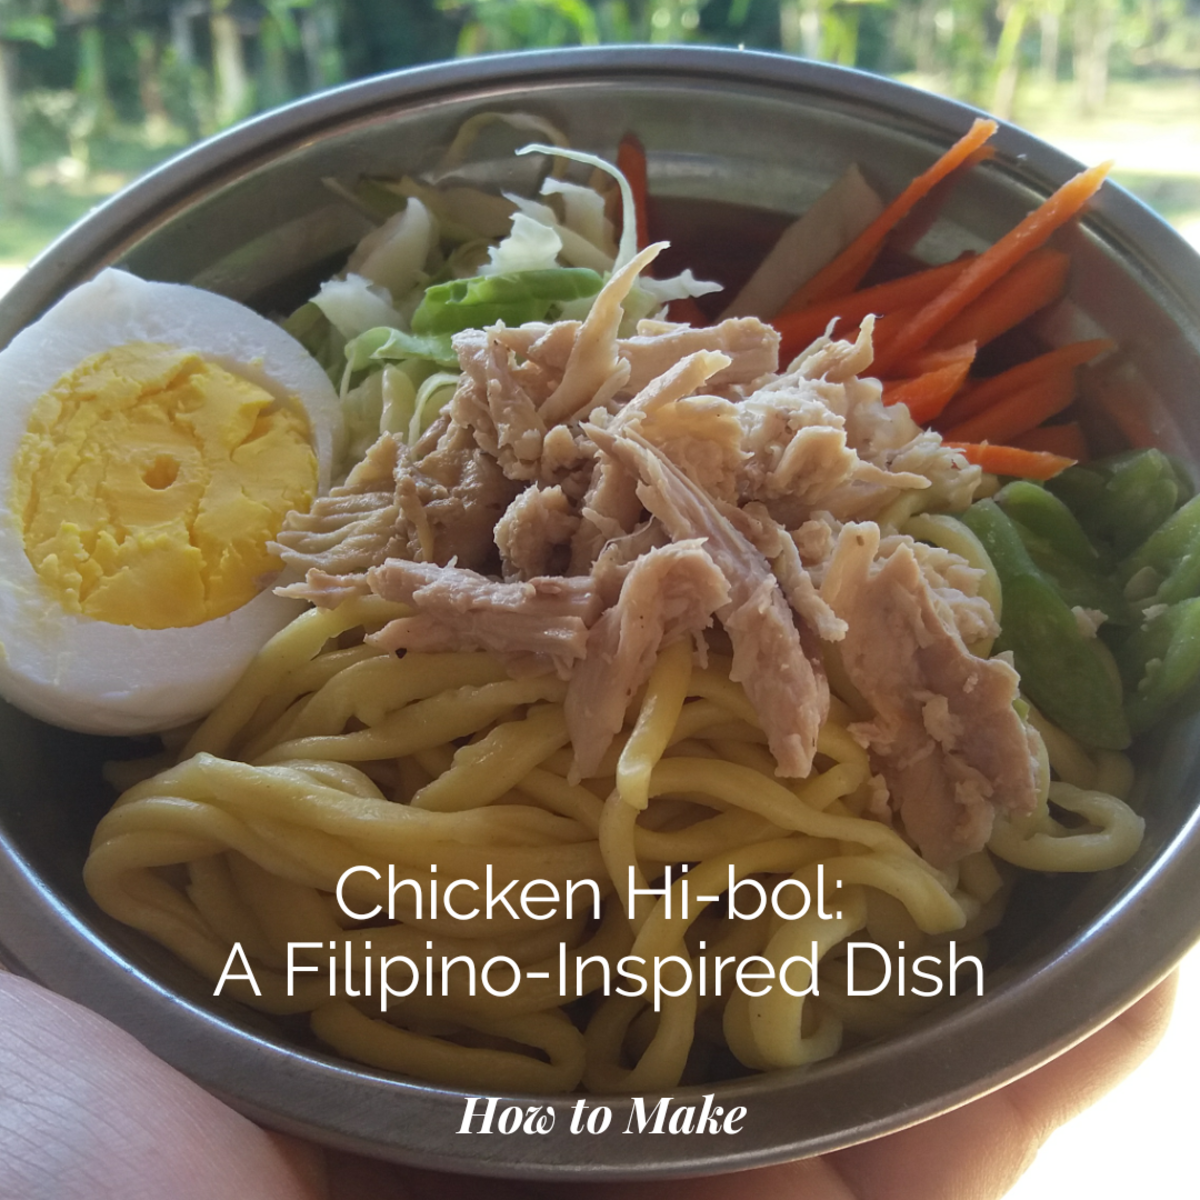 How to Make Chicken Hi-Bol: A Filipino-Inspired Dish